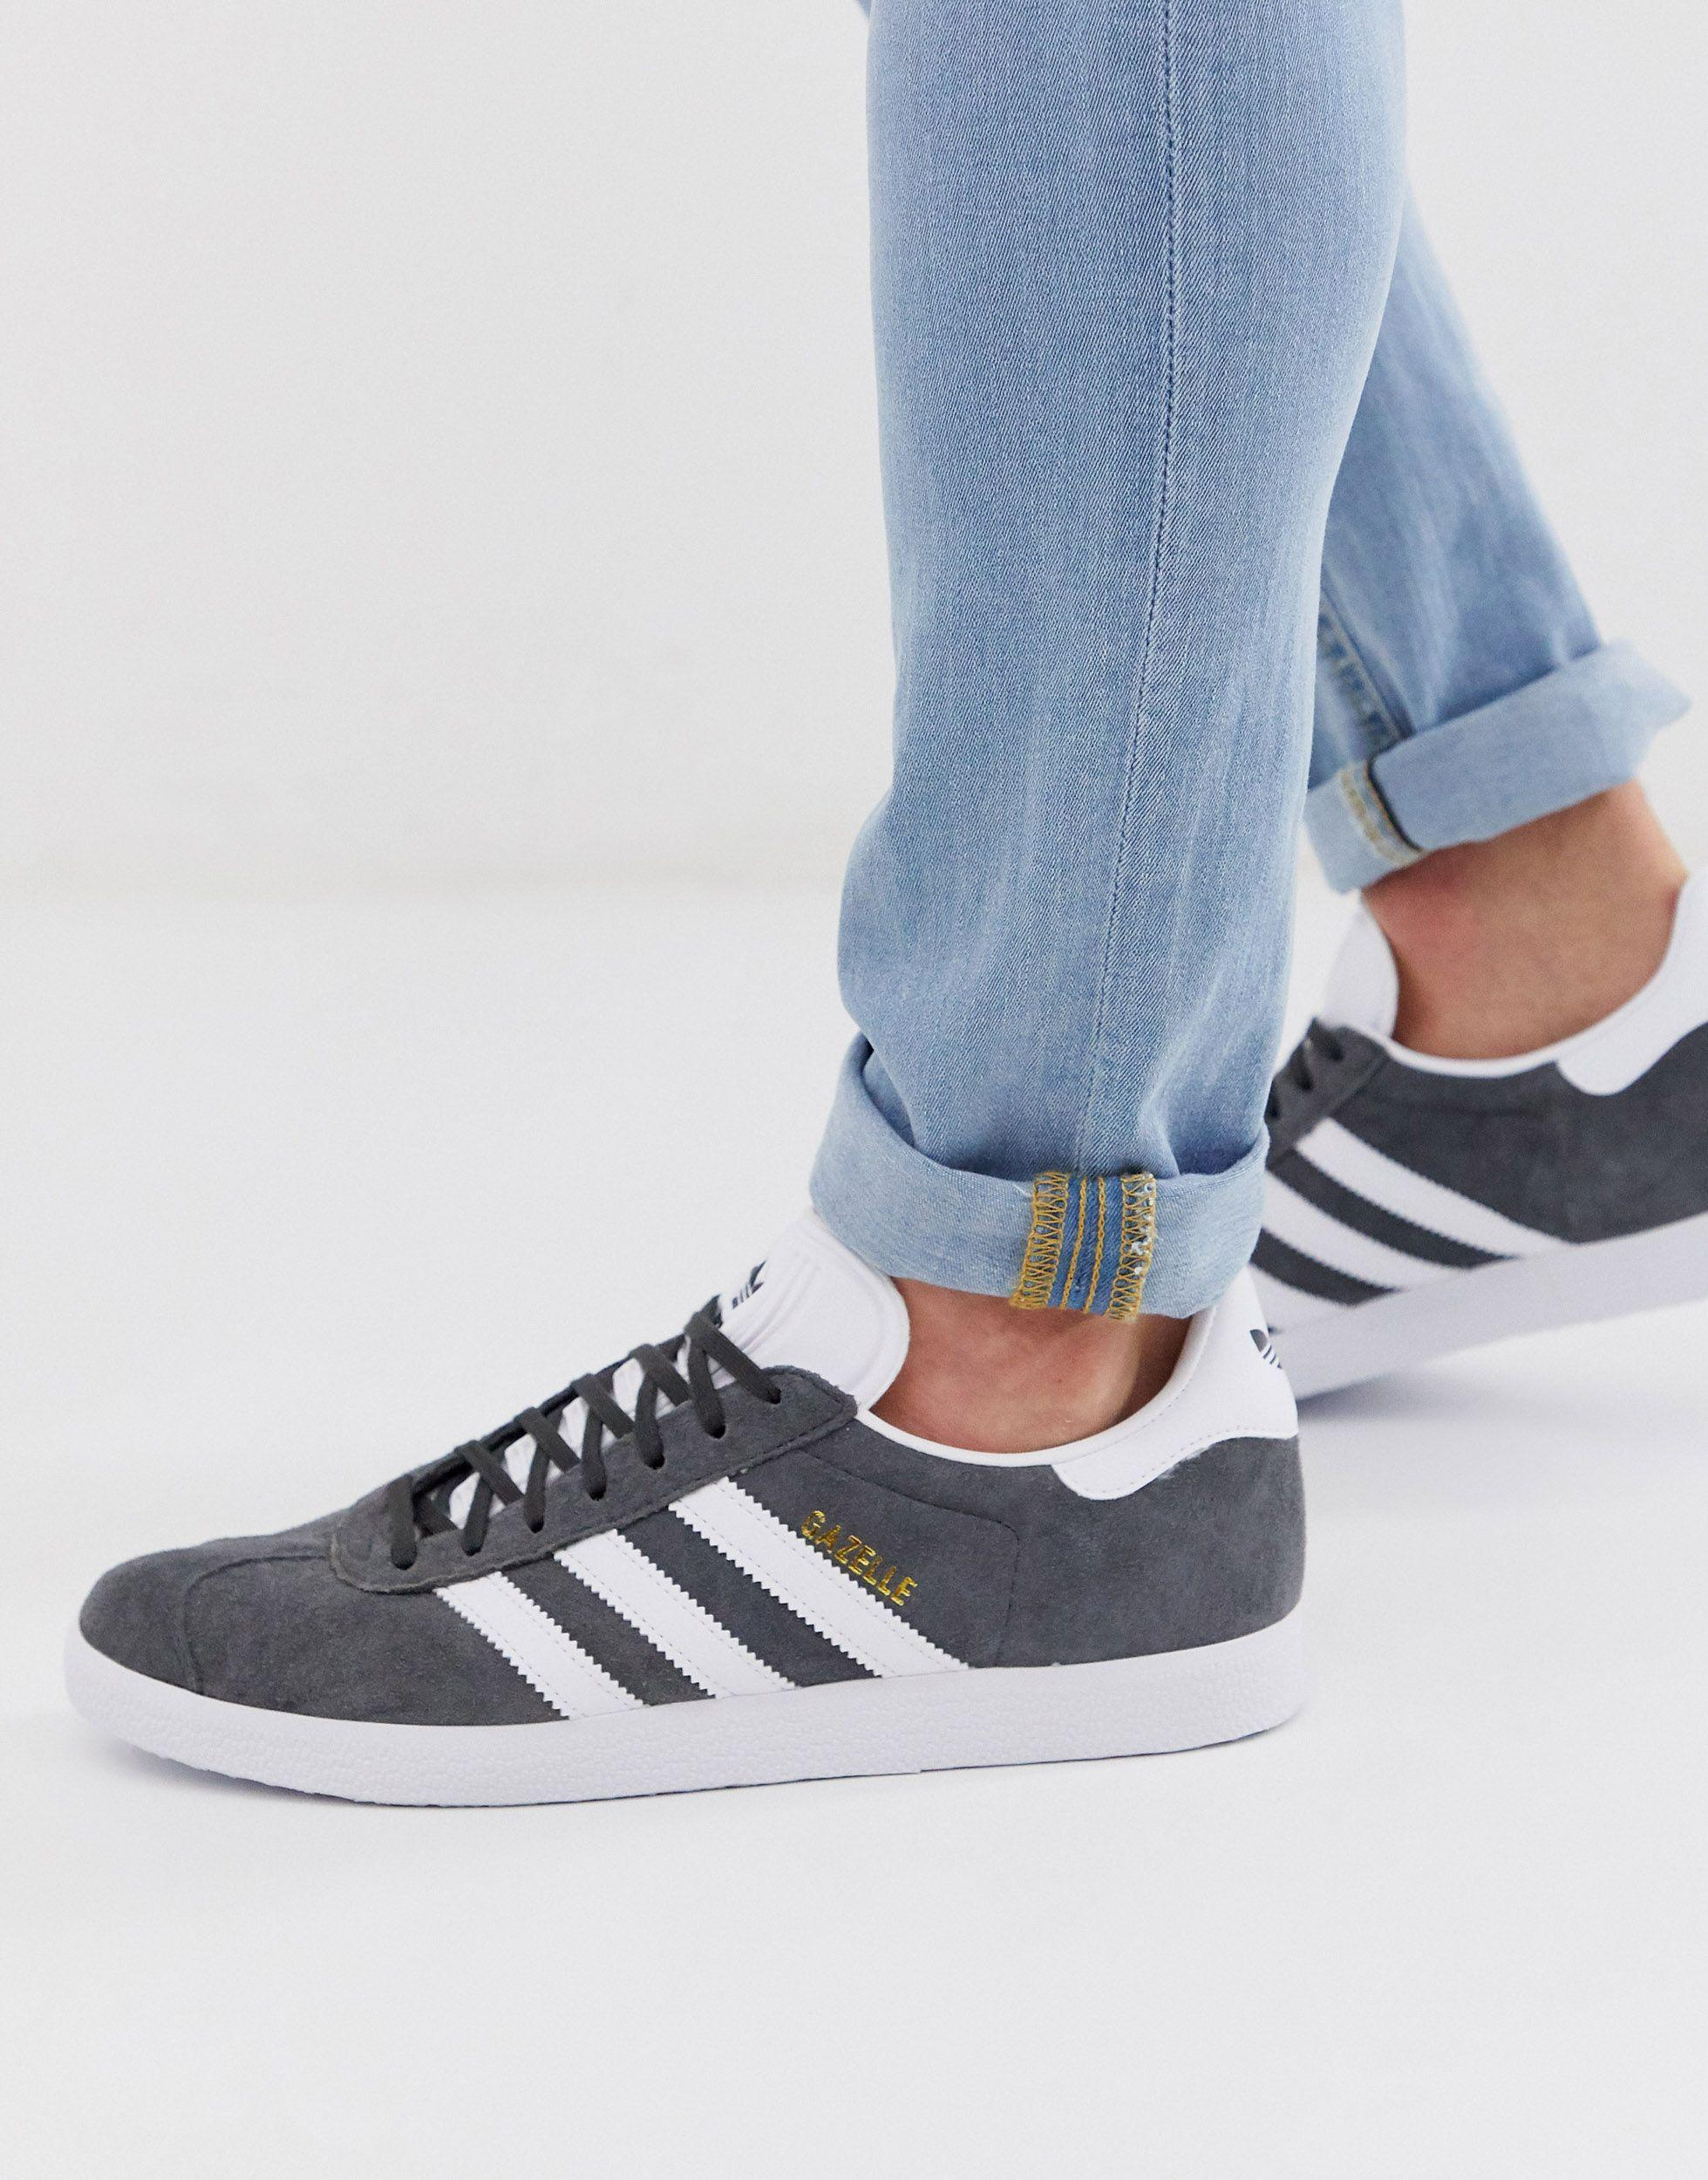 Adidas Originals Gray Gazelle Trainers for men